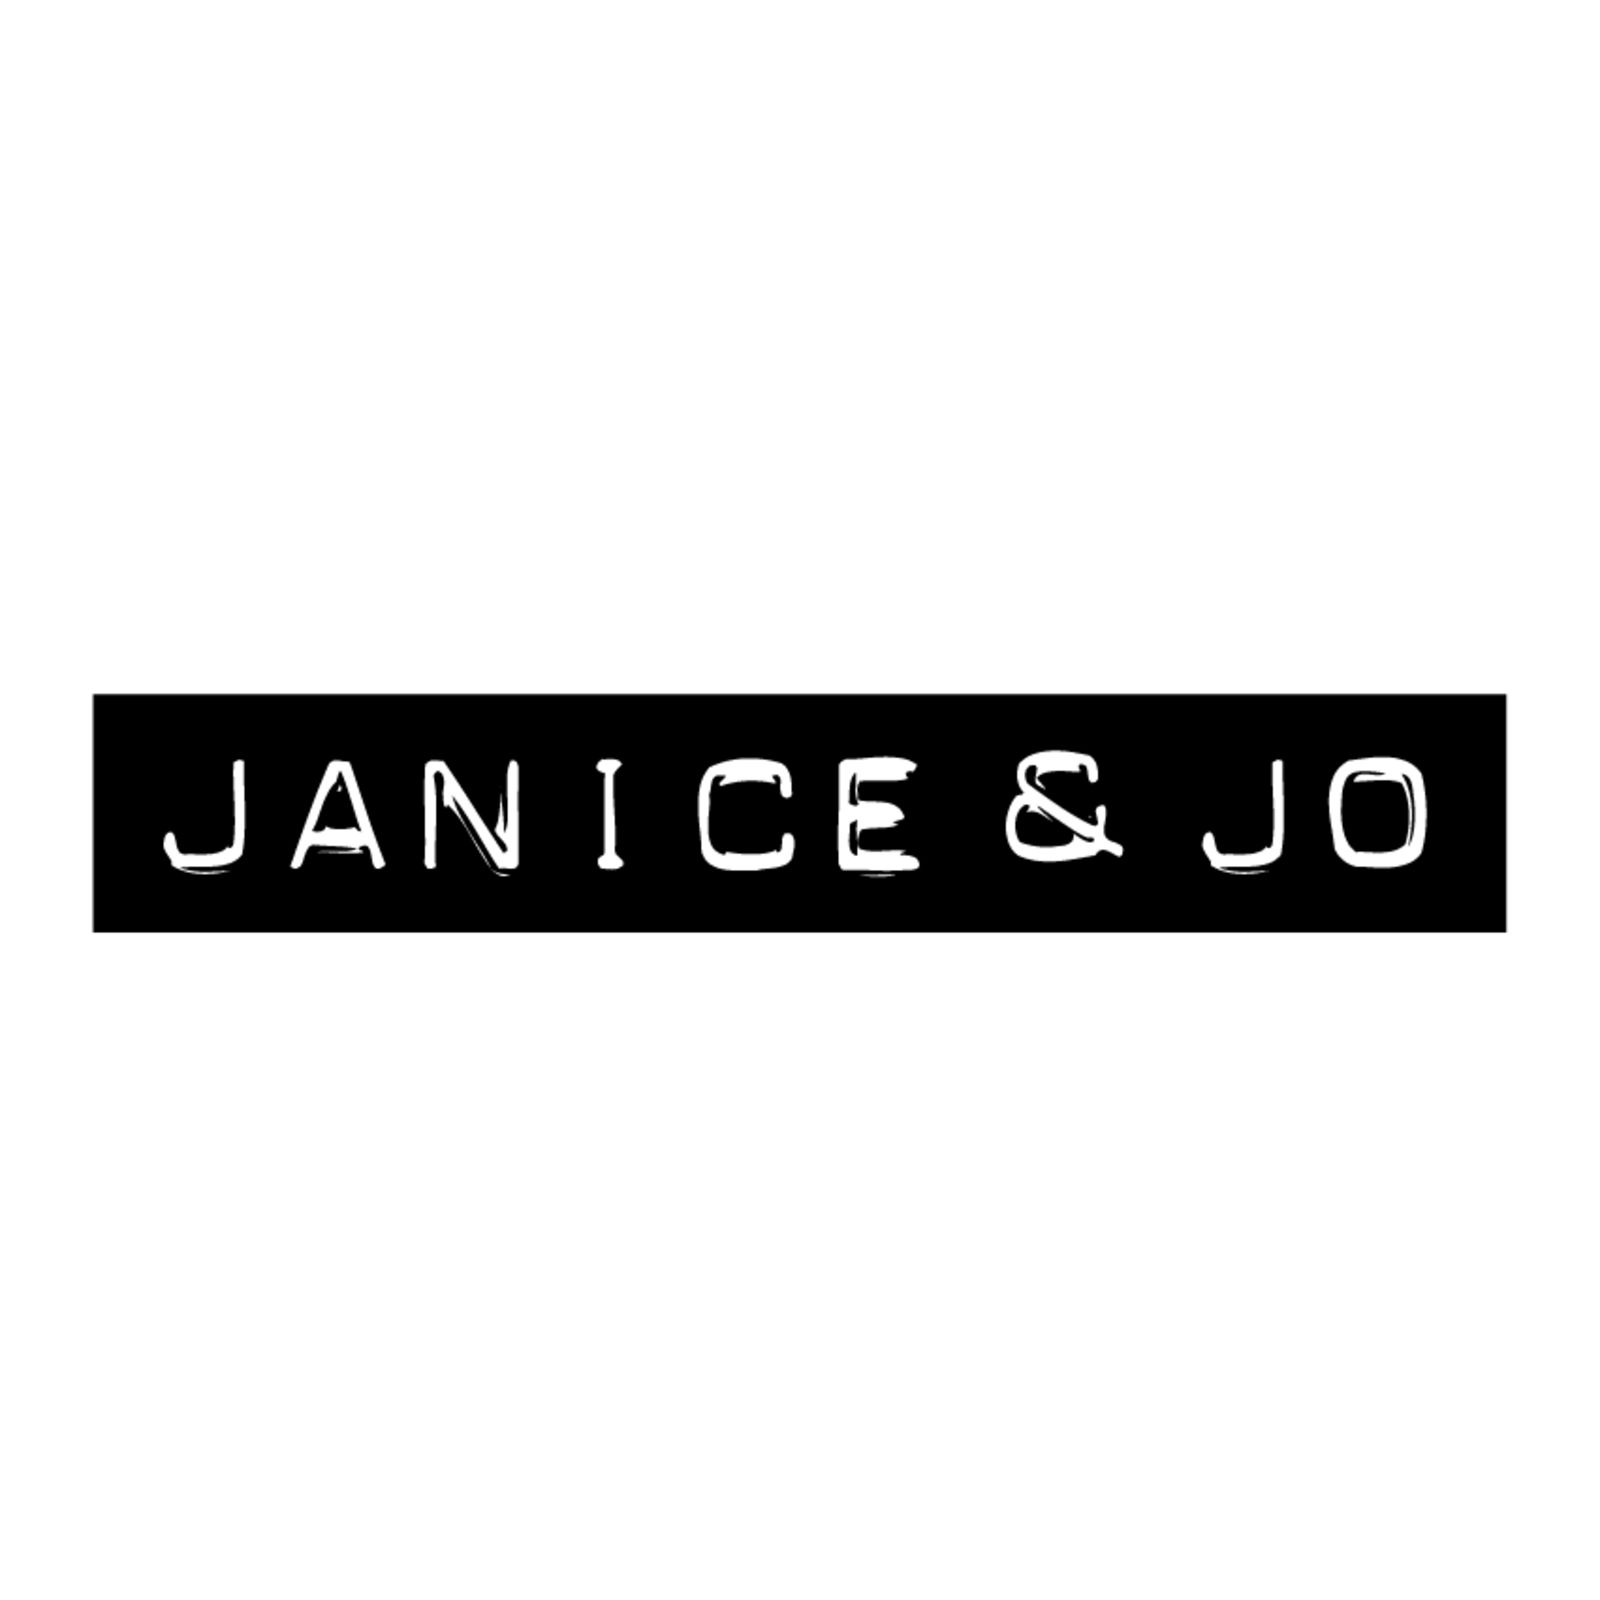 JANICE & JO